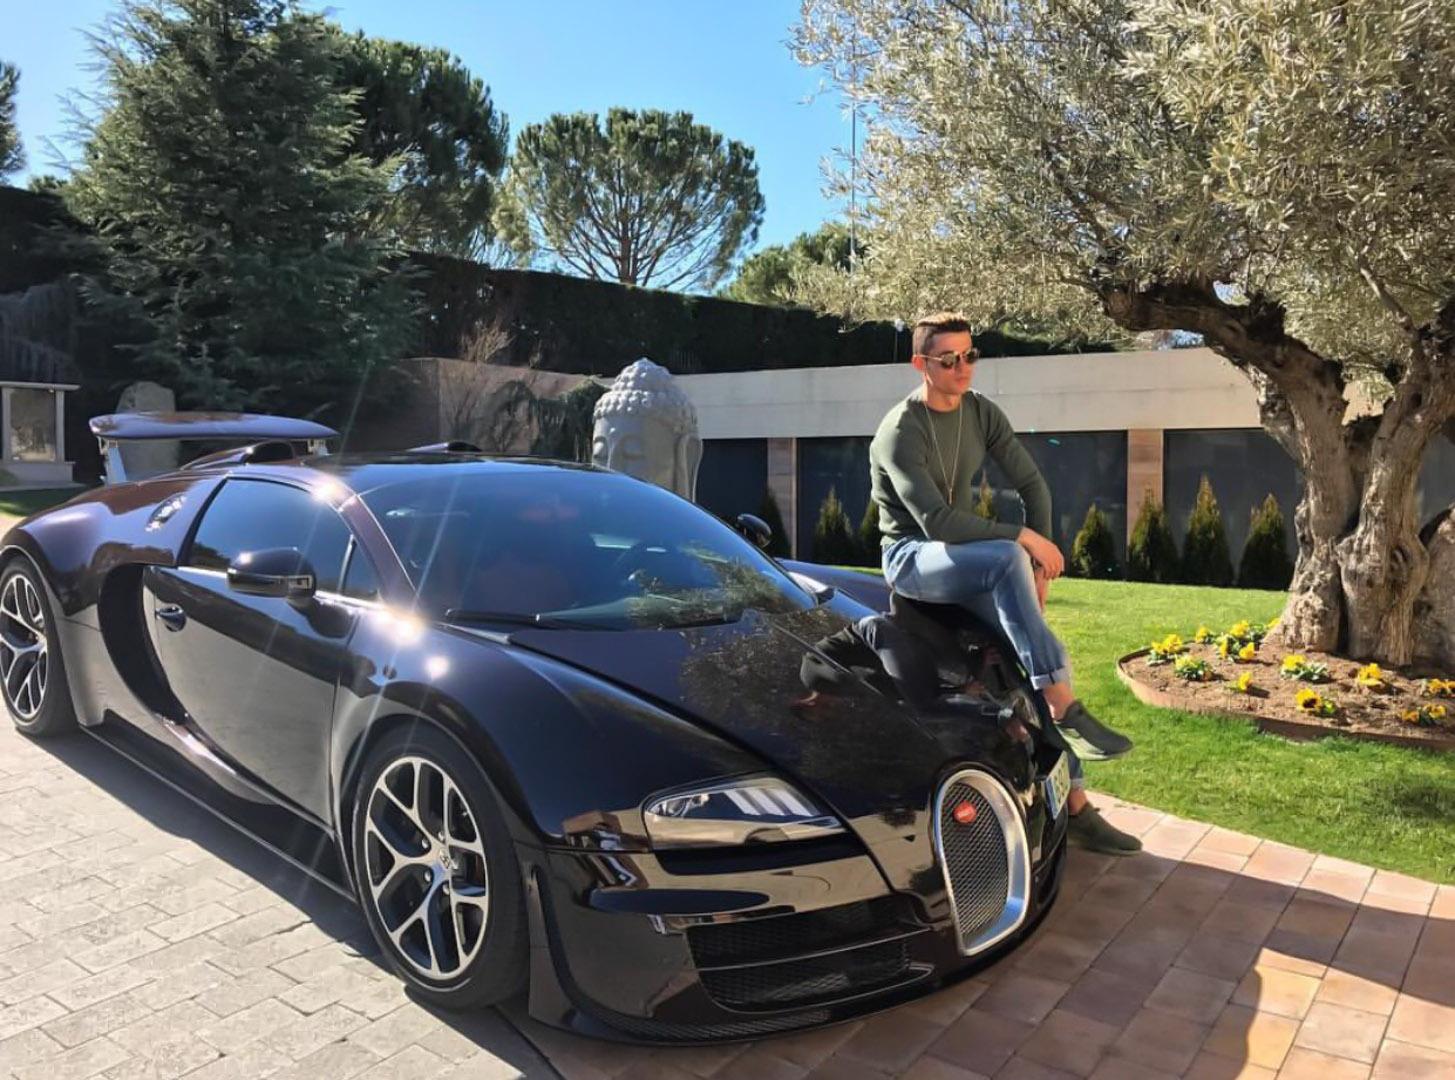 CP-Bộ sưu tập xe của Cristiano Ronaldo (9).jpg